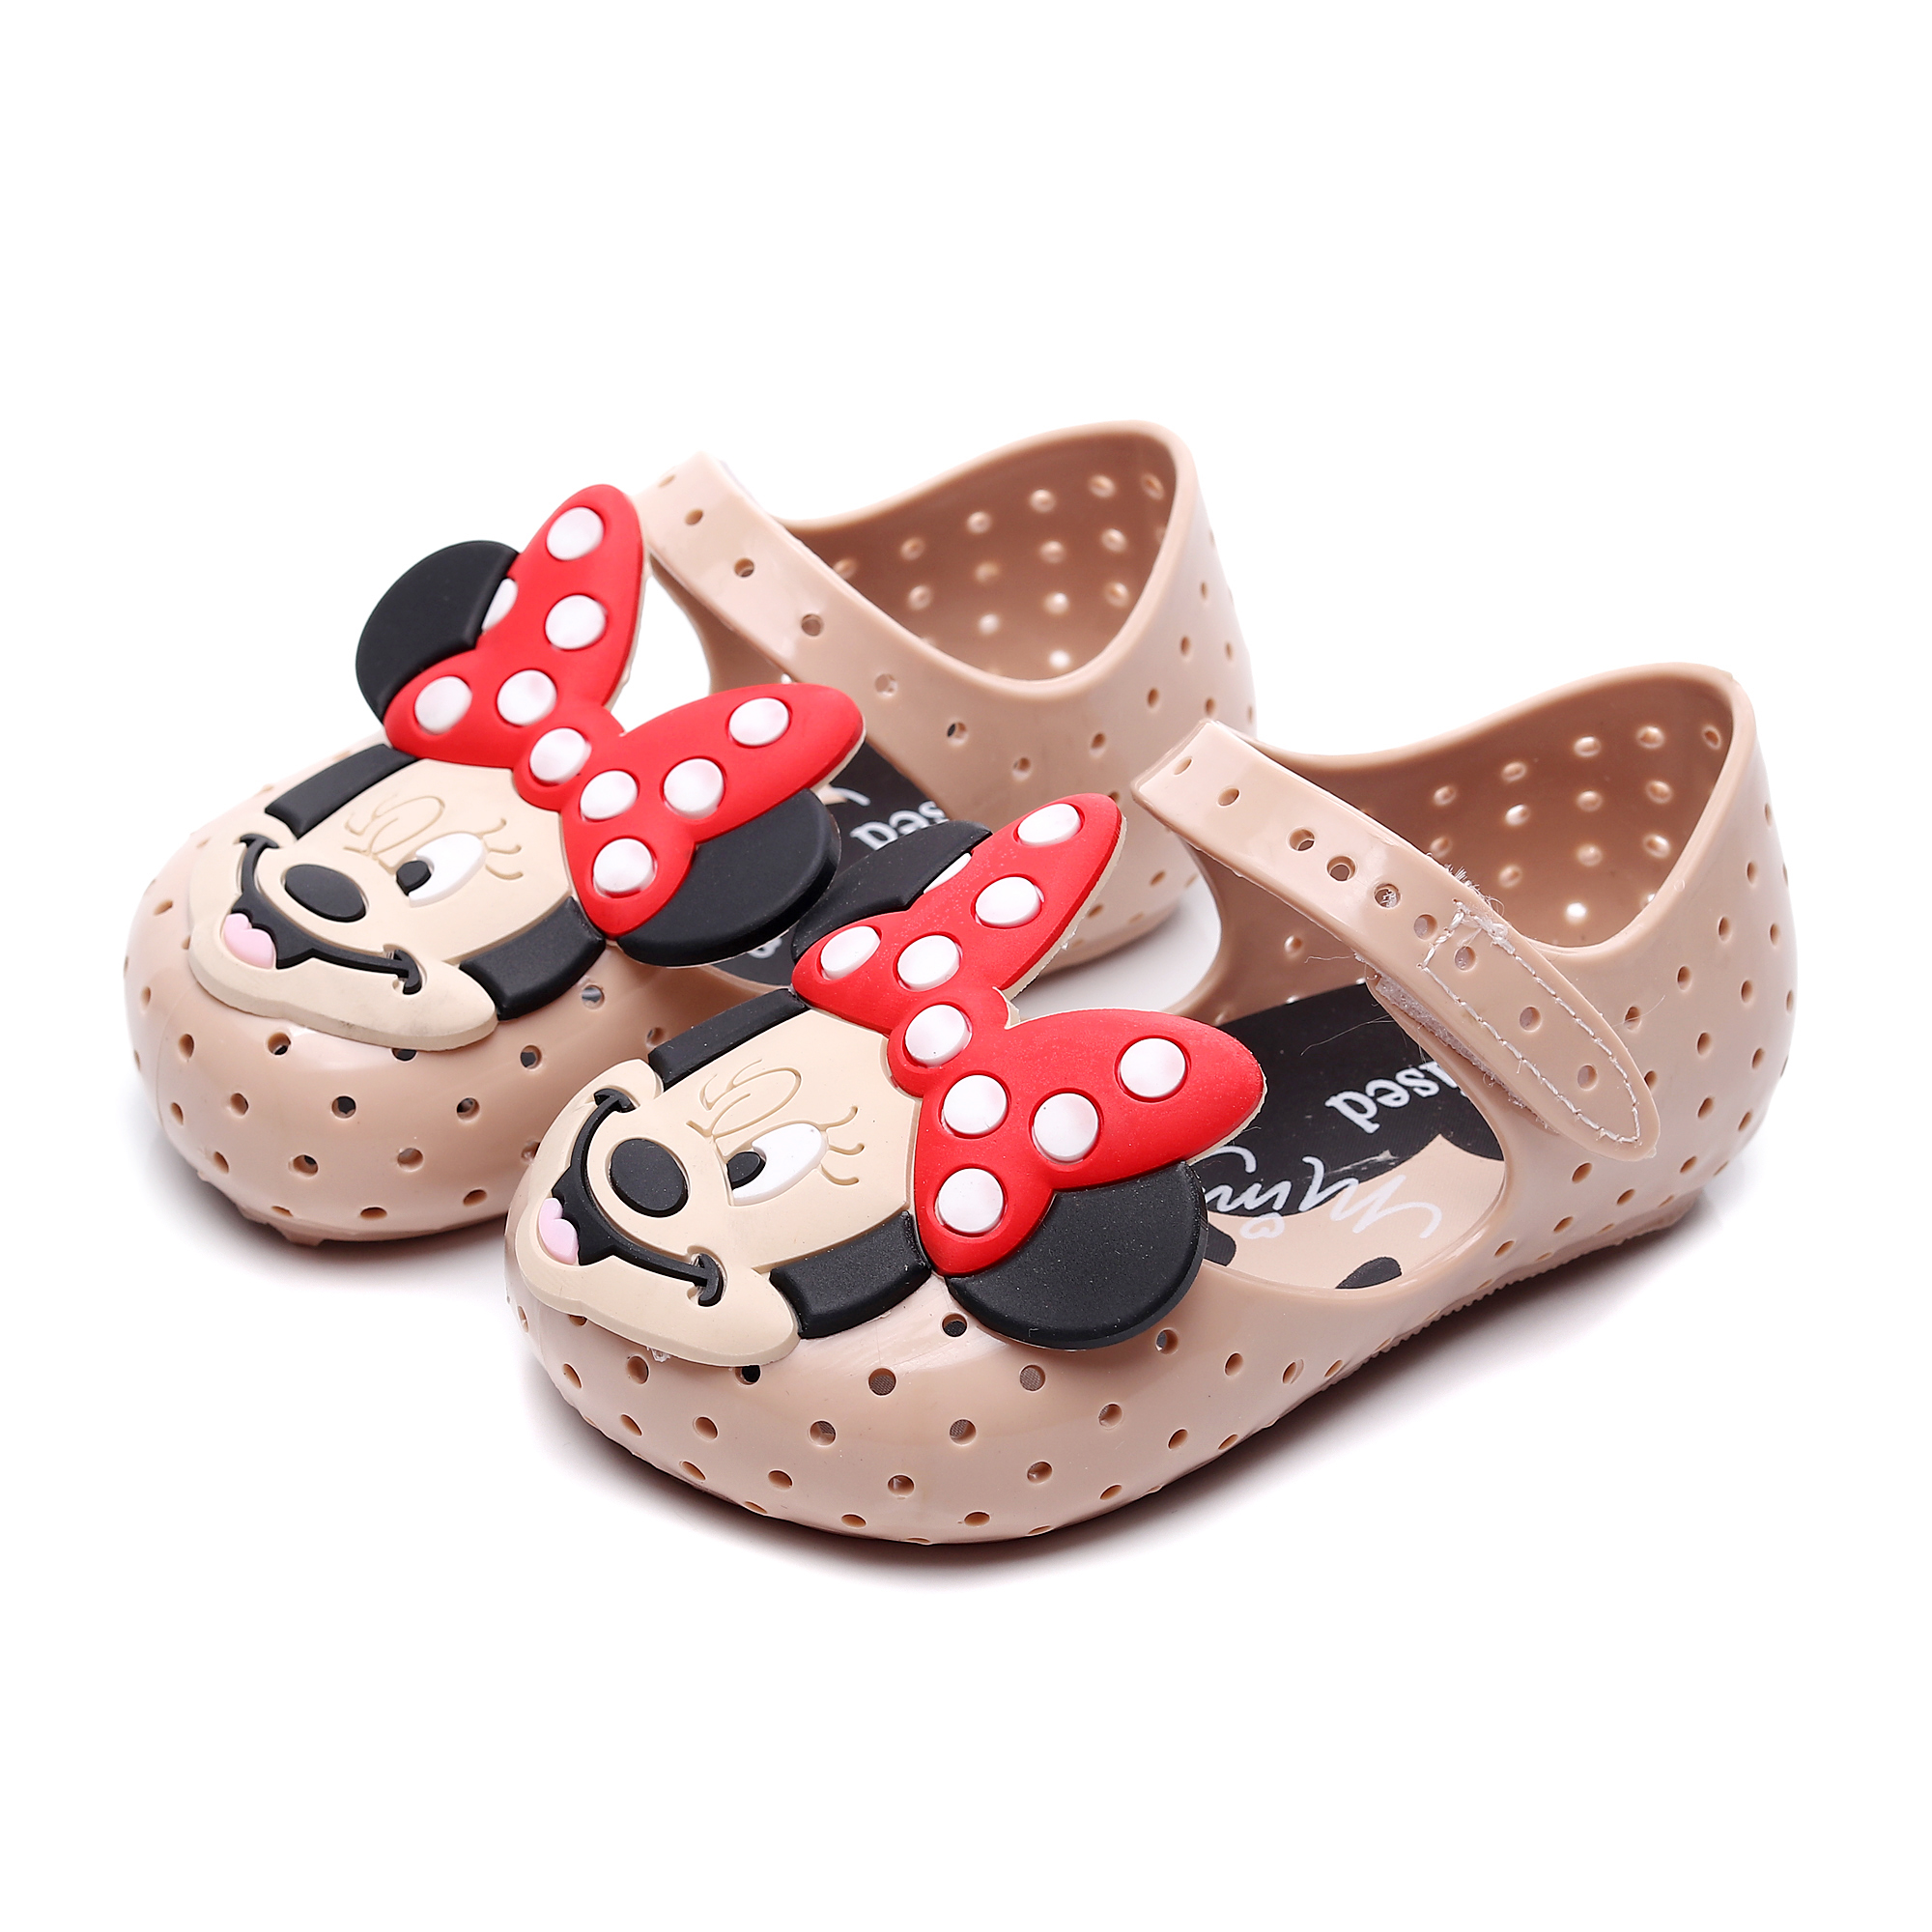 2019 New Mini Melissa Mickey Minnie Kids Shoes Girls Beach Sandals Soft Bottom Melissa Jelly Shoes High Quality